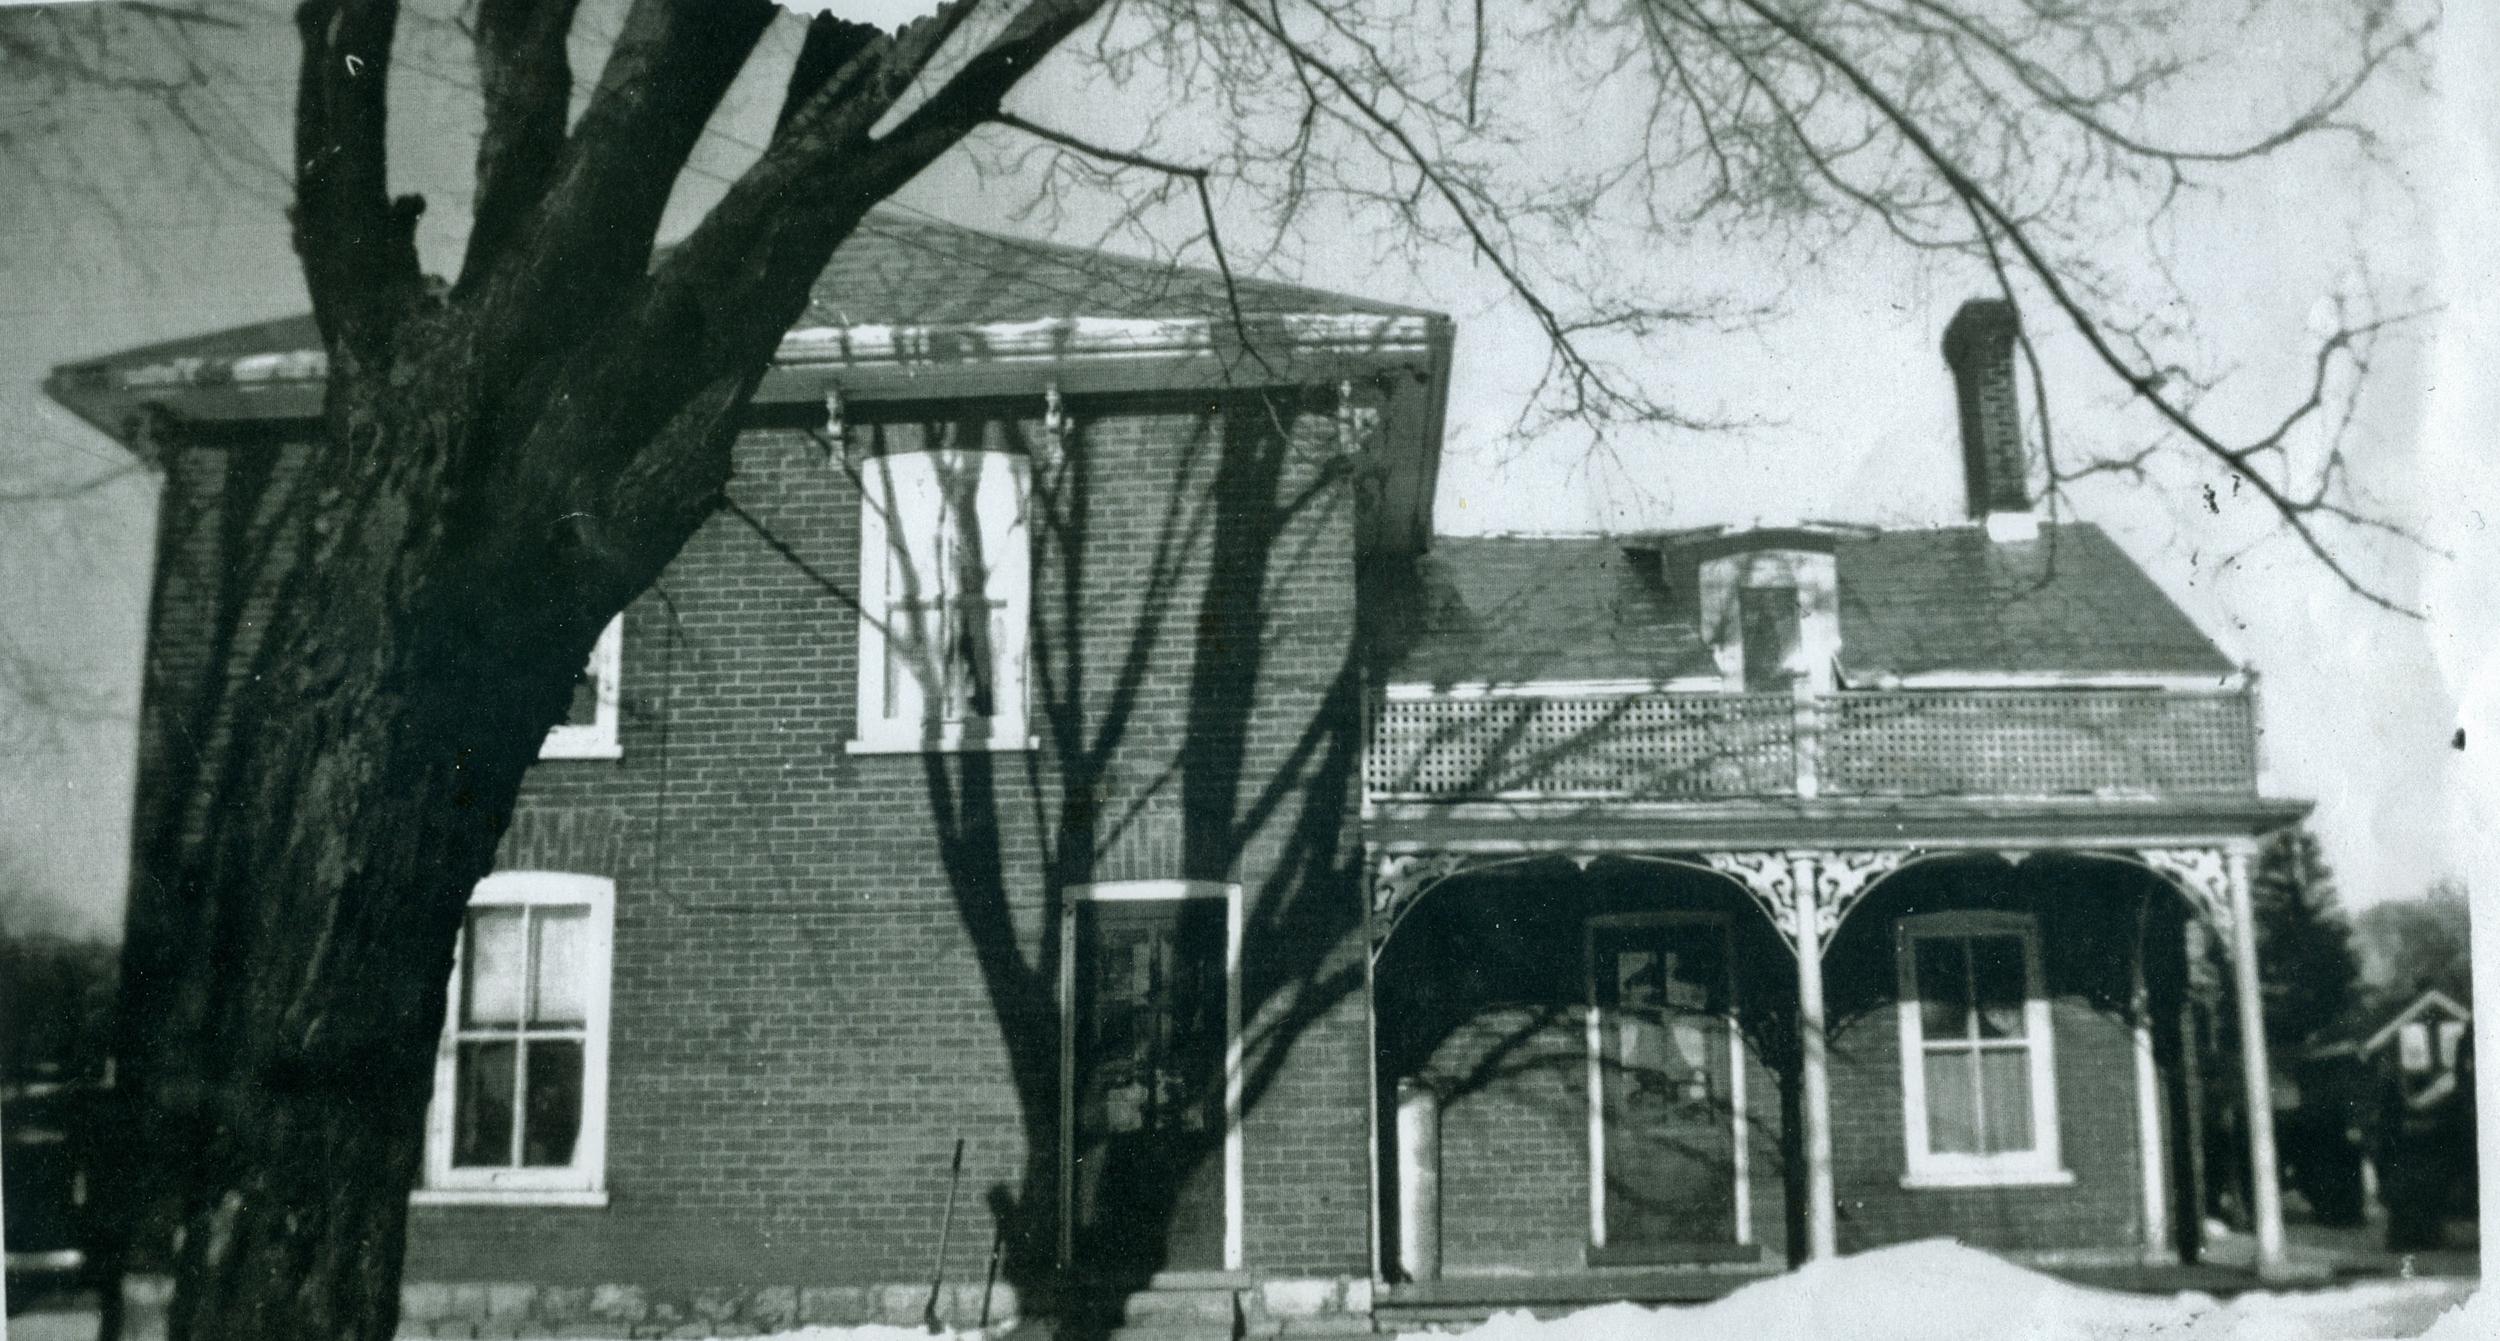 # 7 -48 Forsyth St. Dr. Taft/campbell/vesterfelt